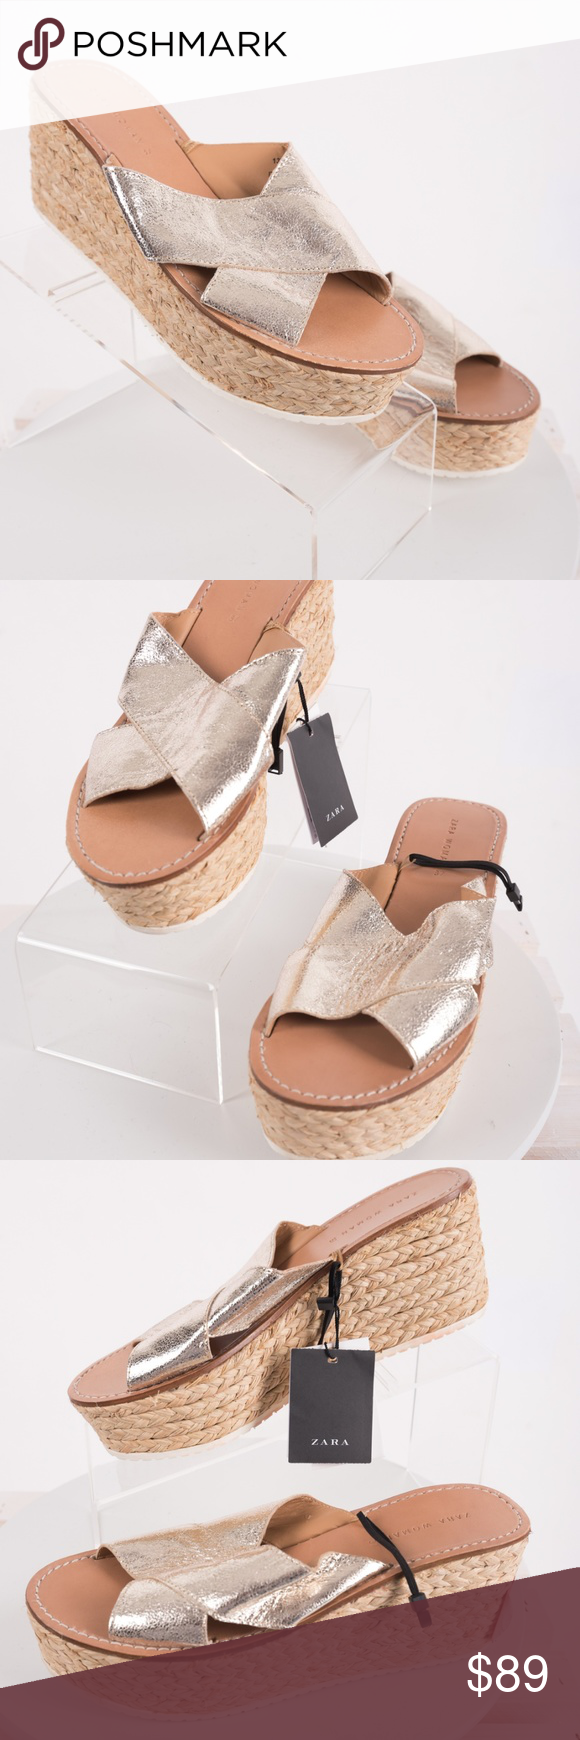 acf5e212652a Zara Jute Wedges Espadrilles Sandals Gold Jute 6.5 Zara Women s Jute Wedges  Espadrilles s19 Sandals 100